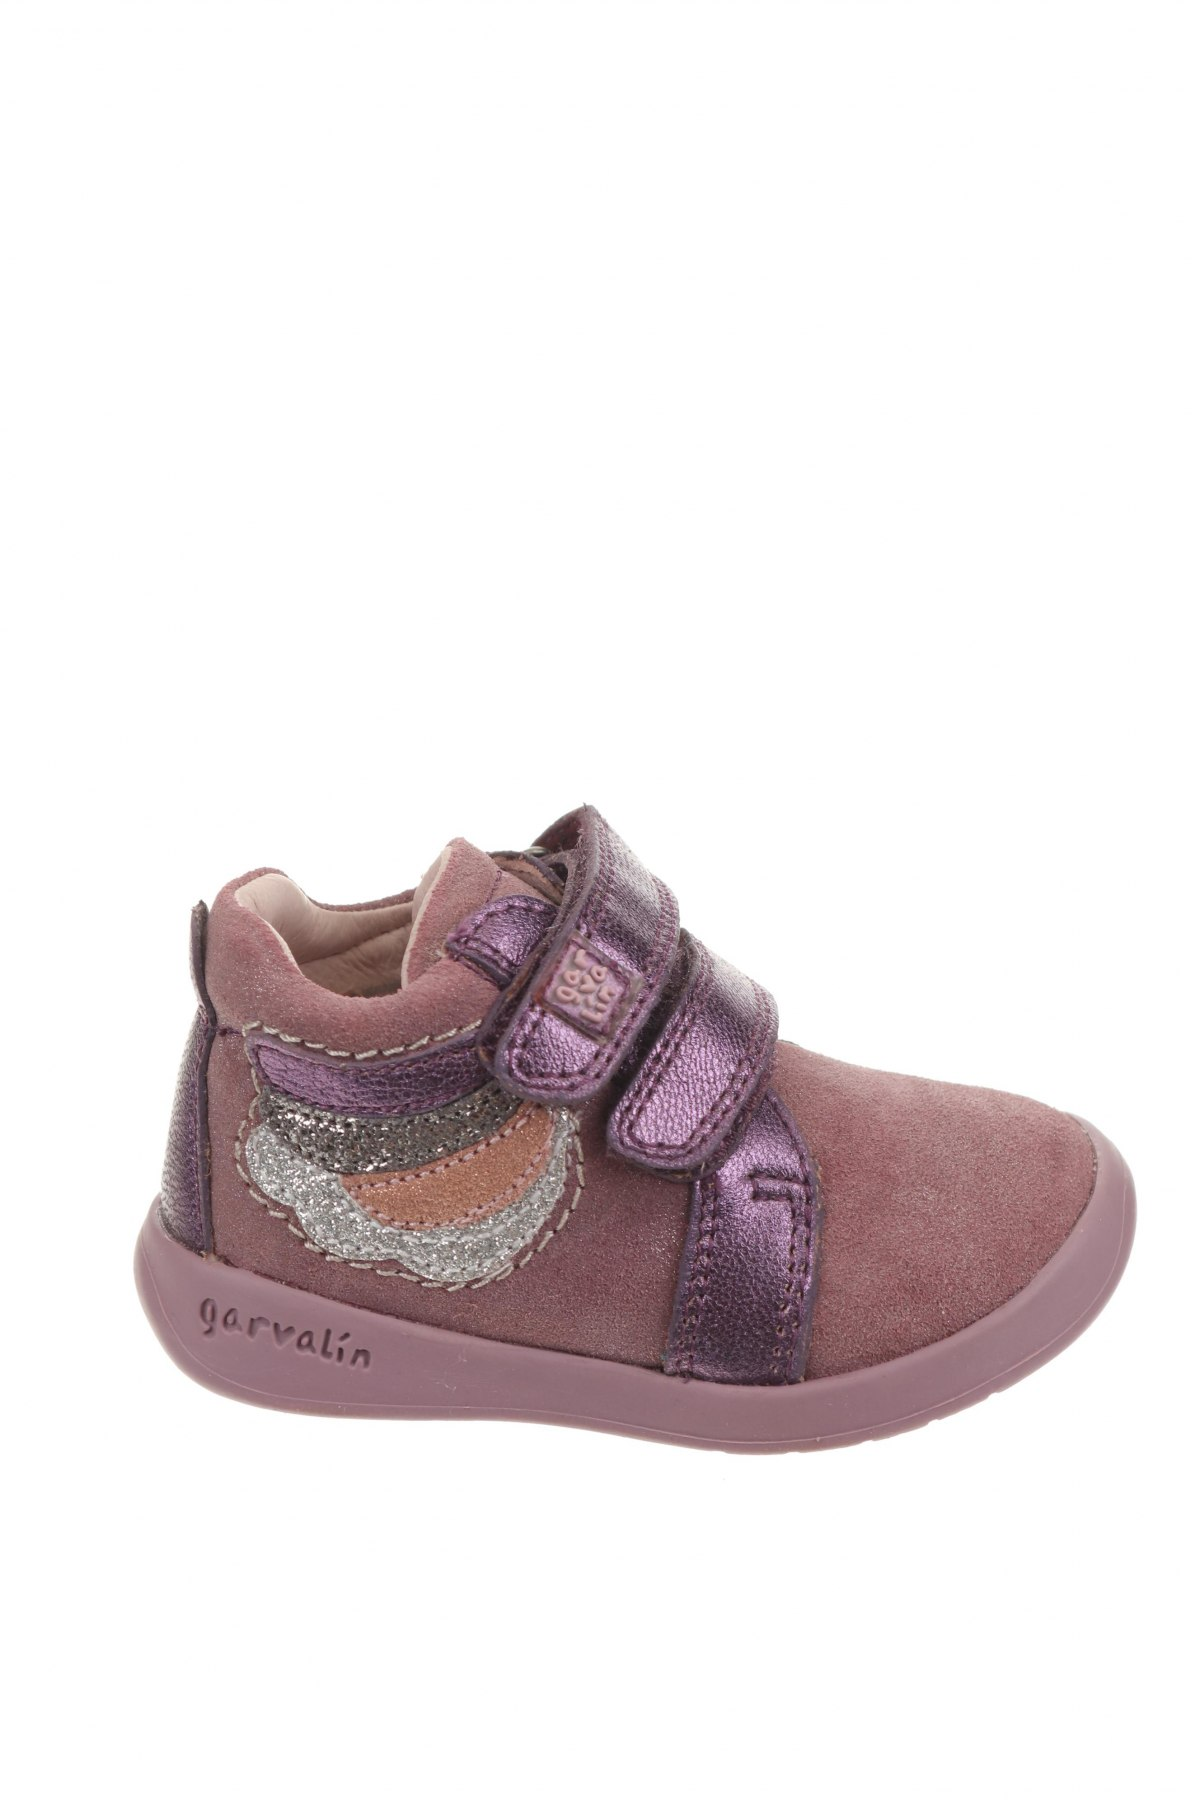 Детски обувки Garvalin, Размер 20, Цвят Розов, Естествен велур, естествена кожа, Цена 66,75лв.